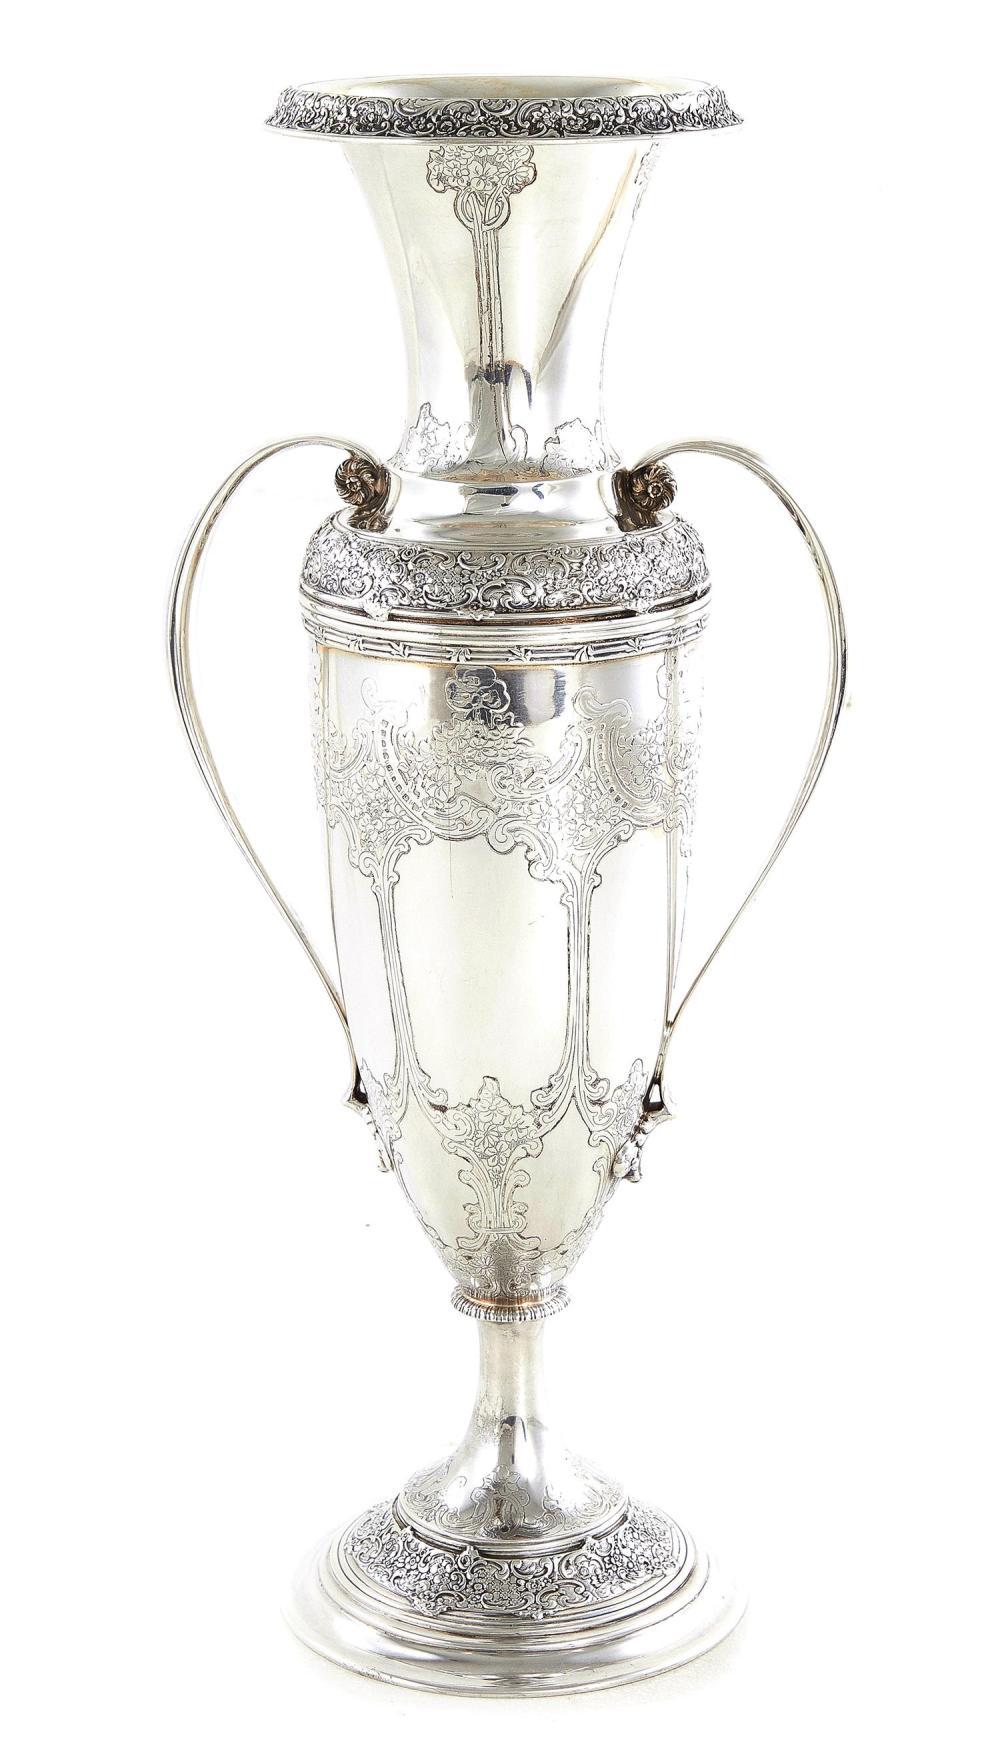 Tiffany & Co silver double handle vase